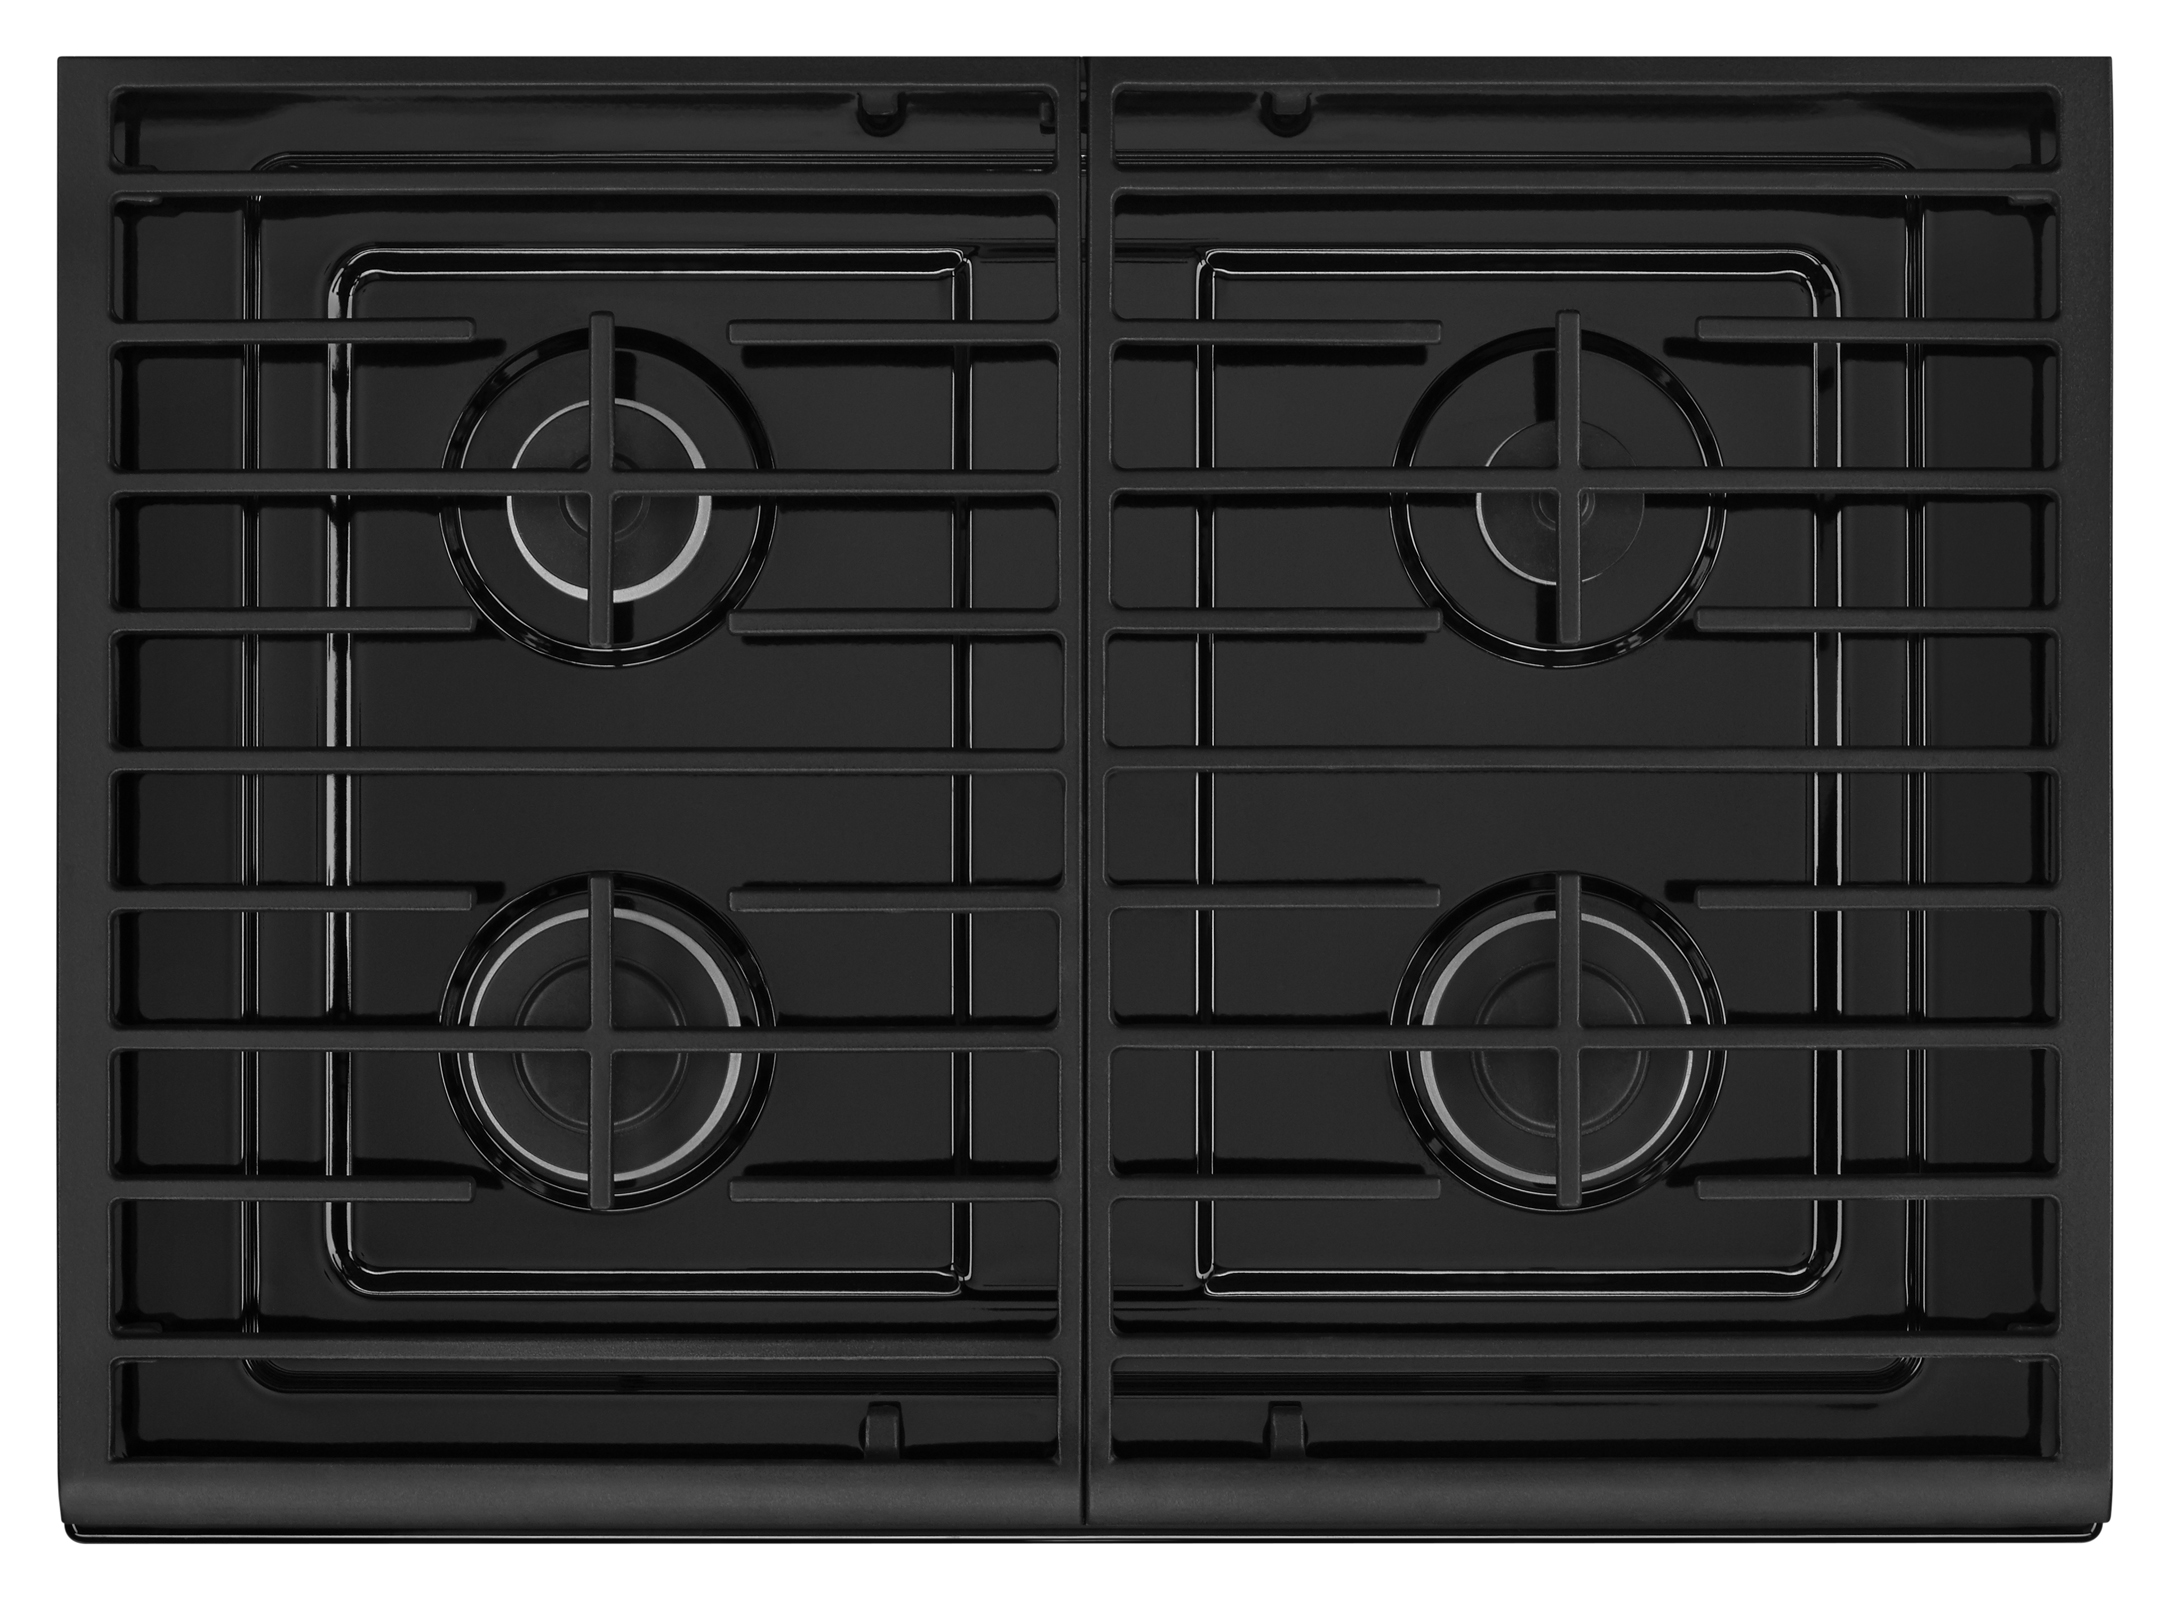 Whirlpool WFG515S0EB 5.0 cu. ft. Freestanding Gas Range - Black